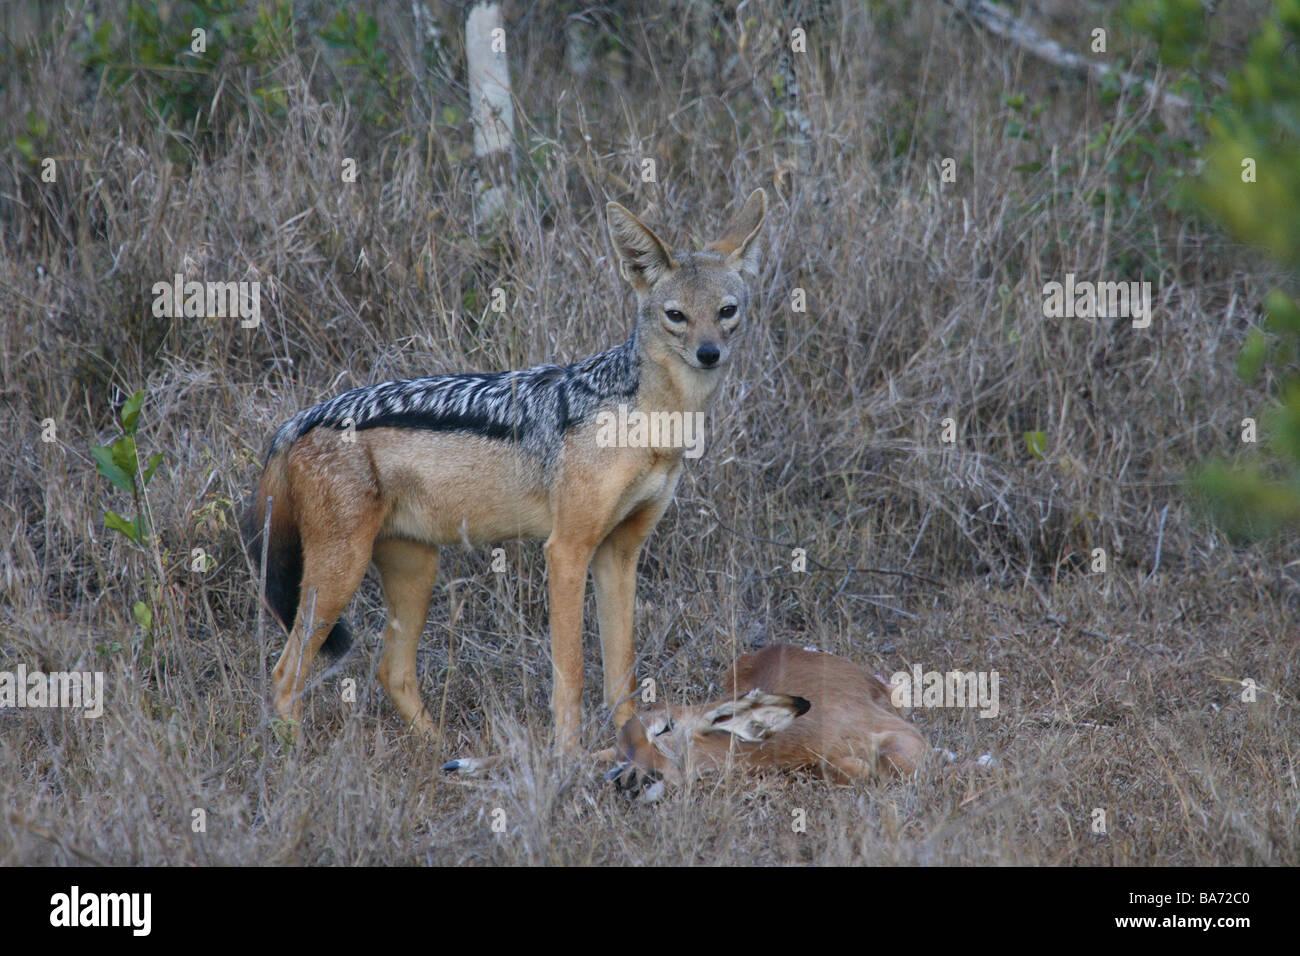 Schabrackenschakal Canis mesomelas loot gazelle Africa Kenya wildlife wilderness Wildlife animal game-animal mammal - Stock Image